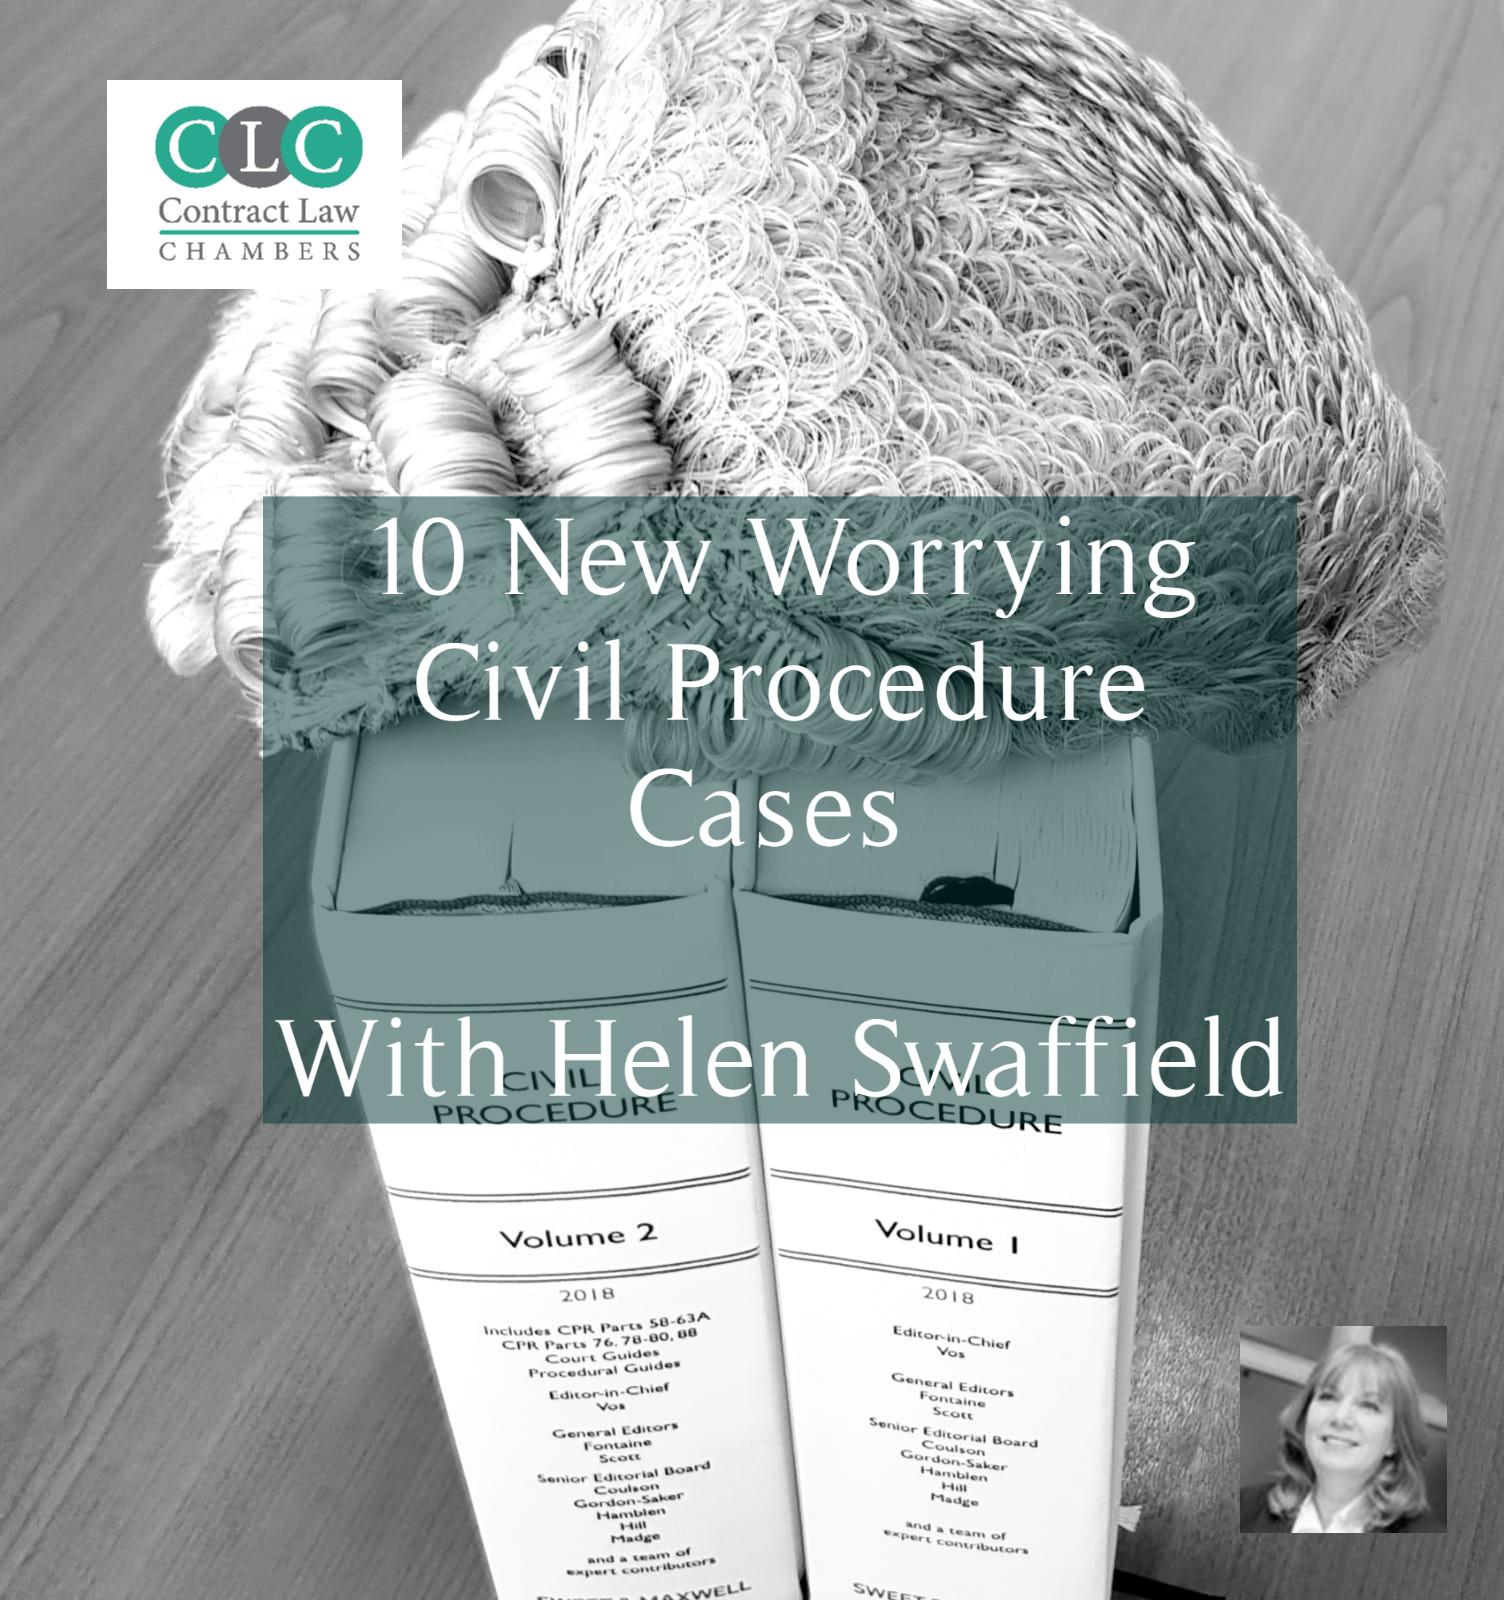 10 New Worrying Civil Procedure Cases